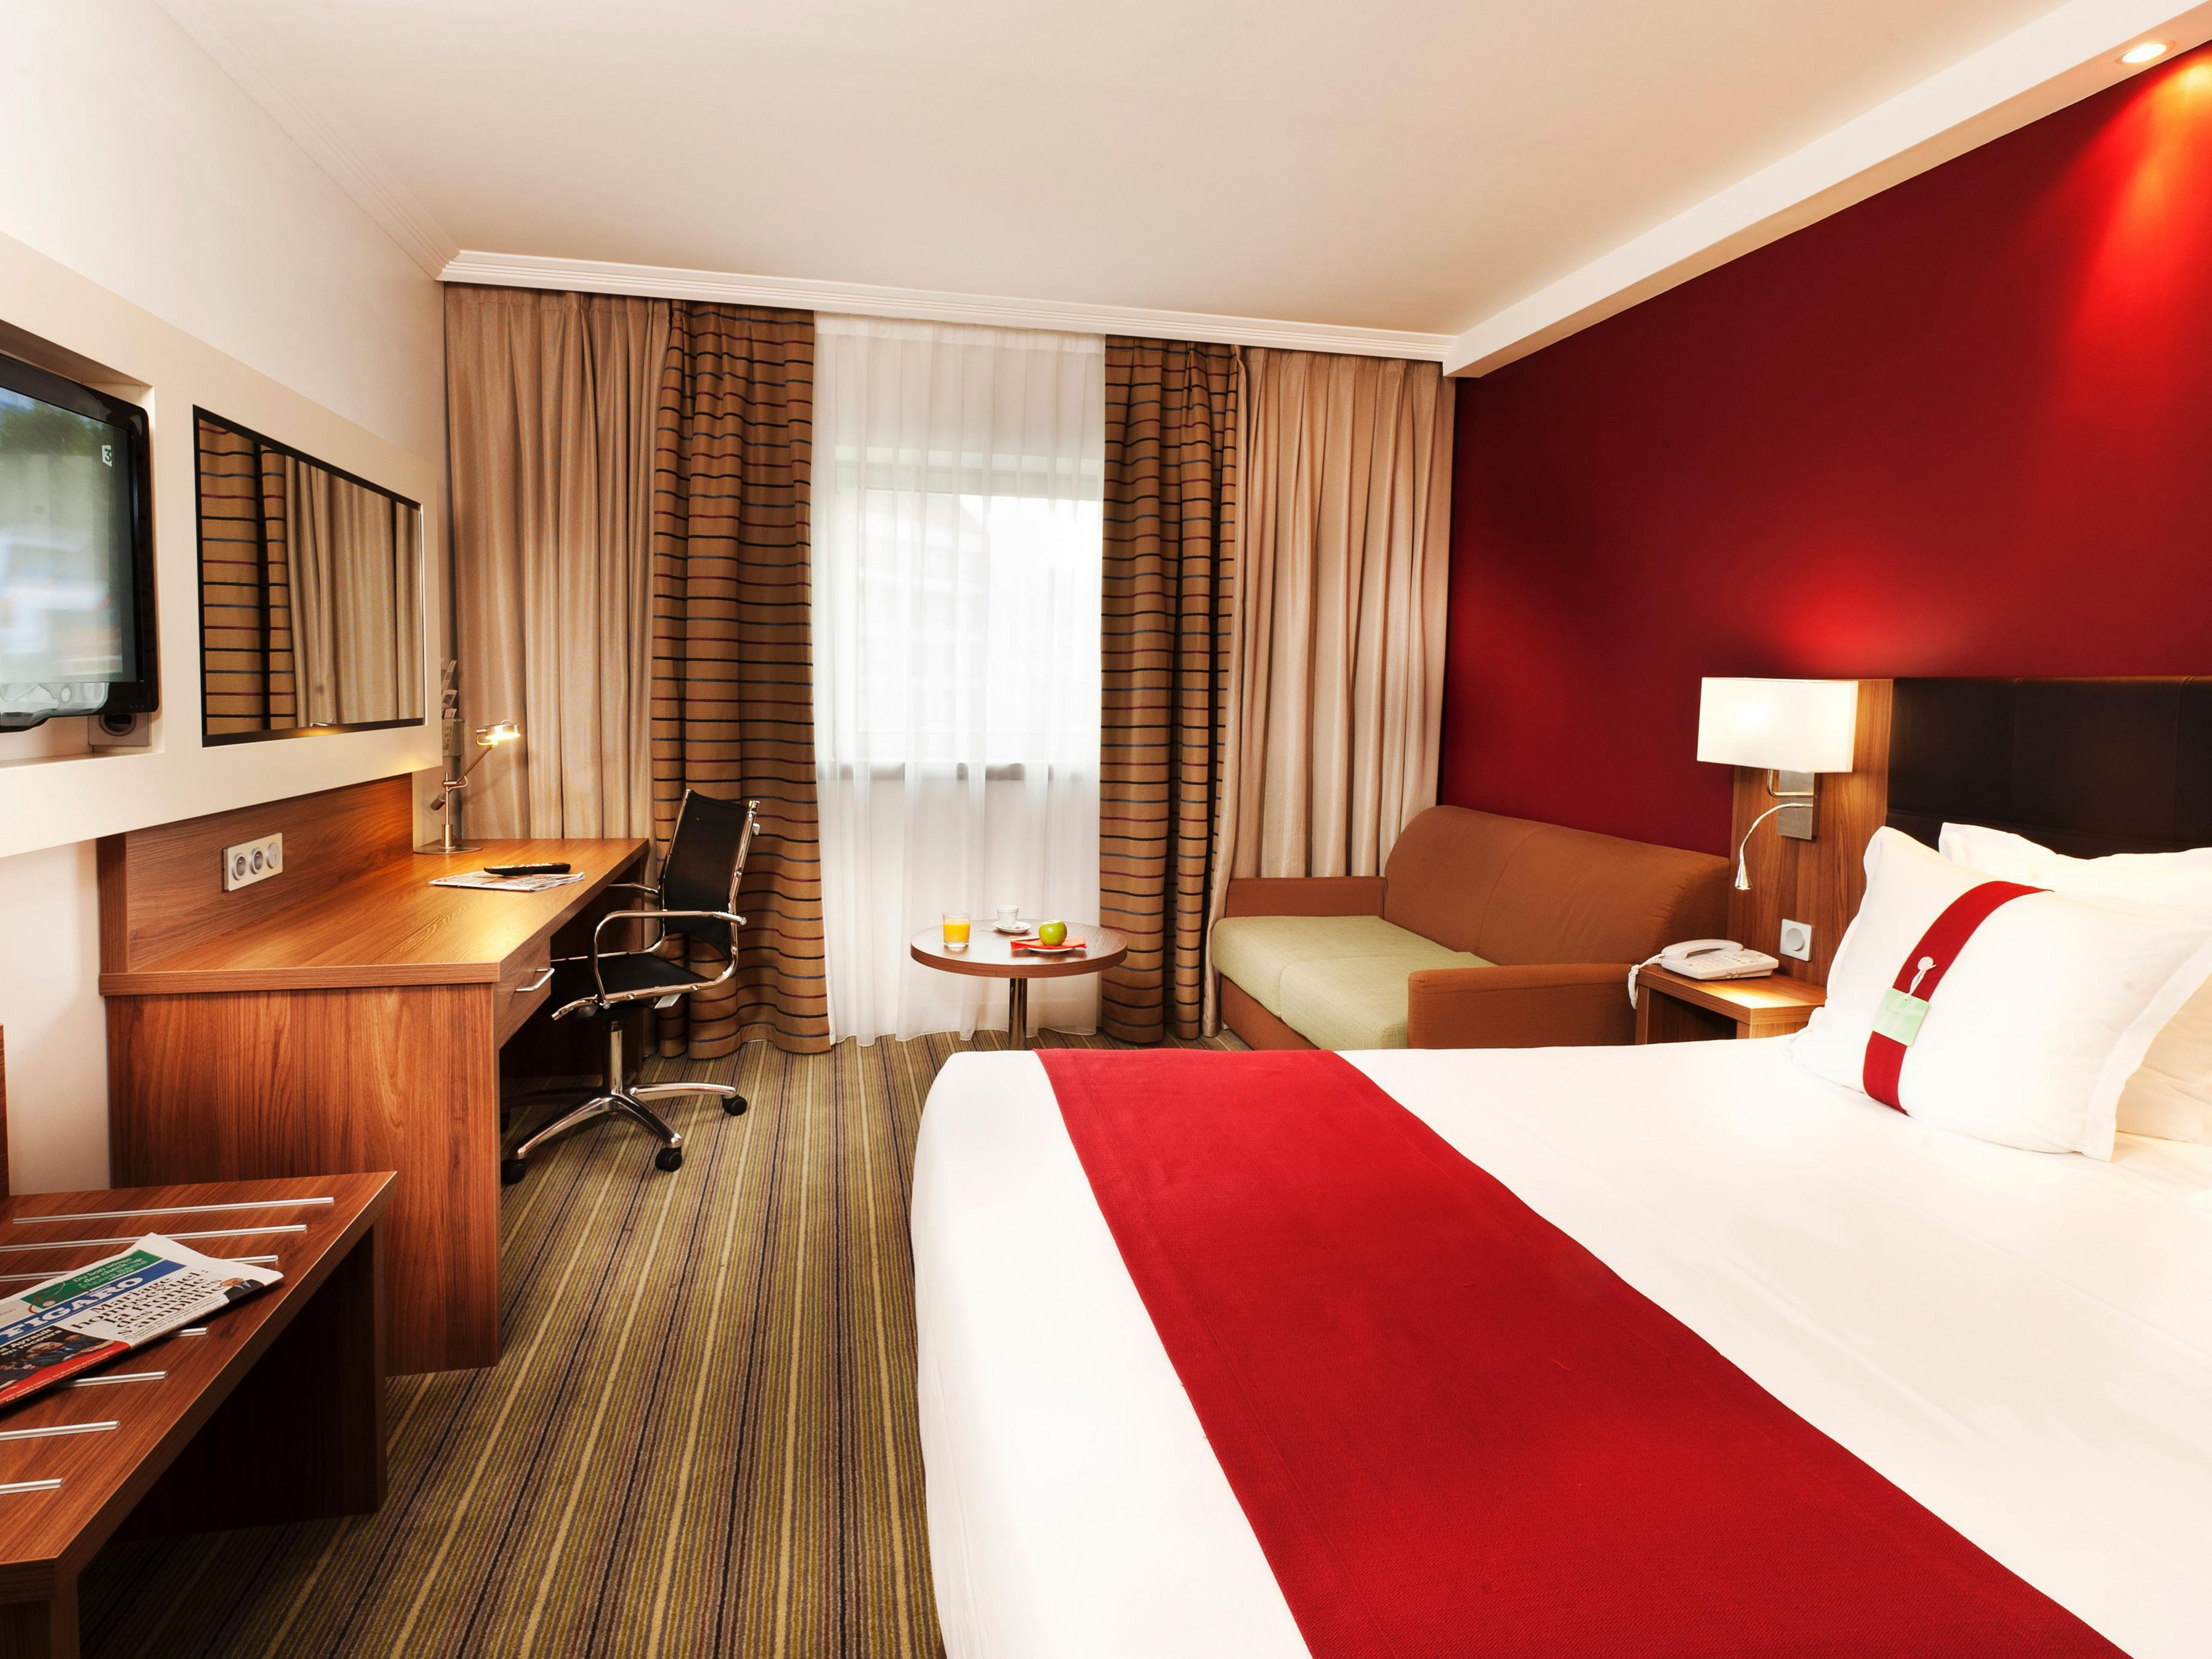 Hotel holiday inn paris marne la vall e barat simo for Habitacion familiar disneyland paris